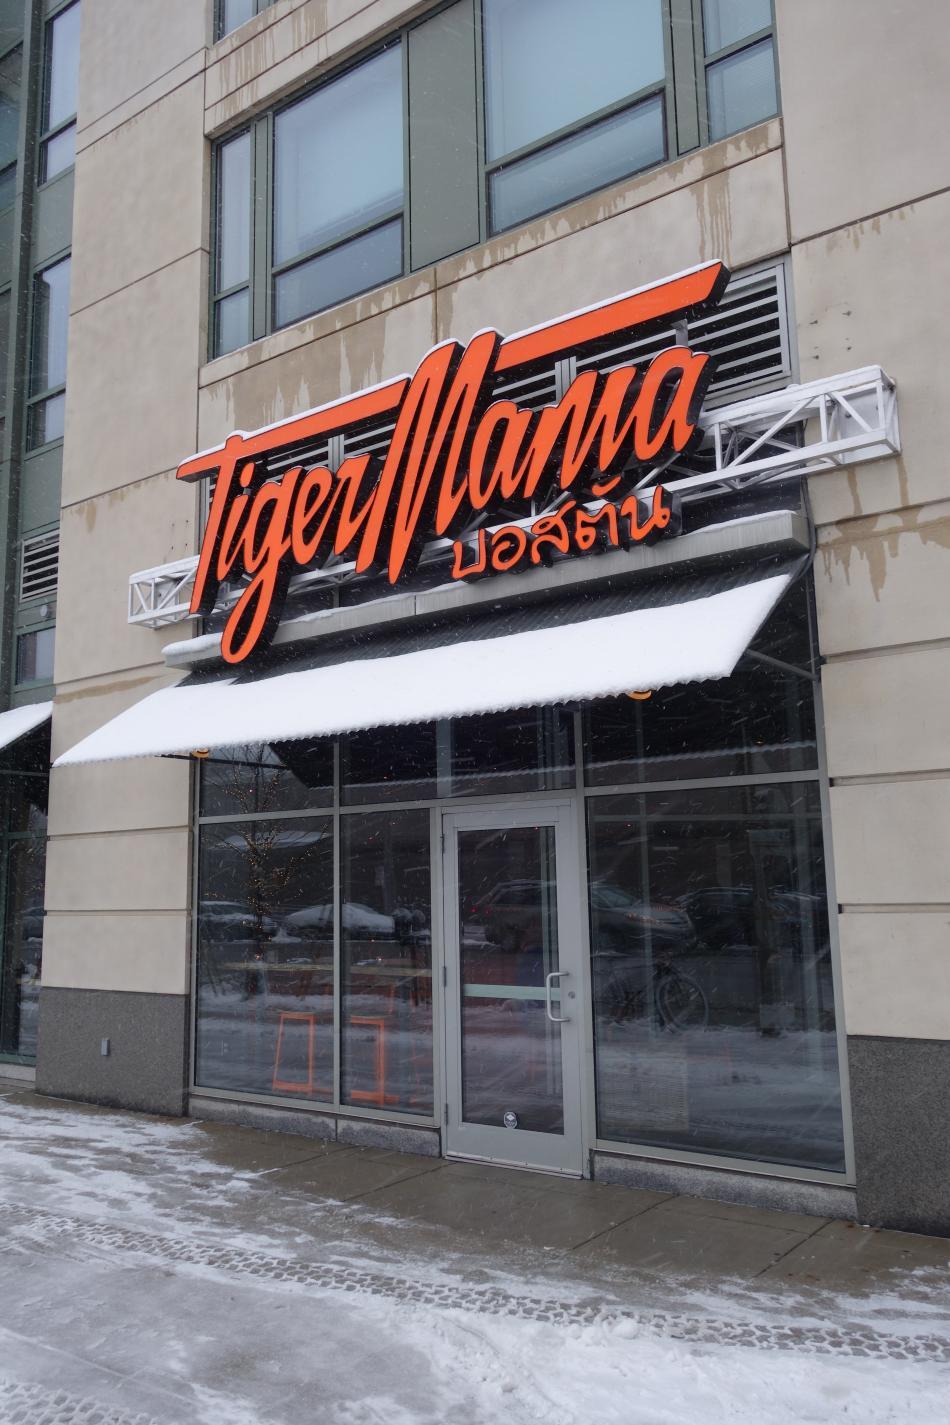 Tiger Mama Storefront